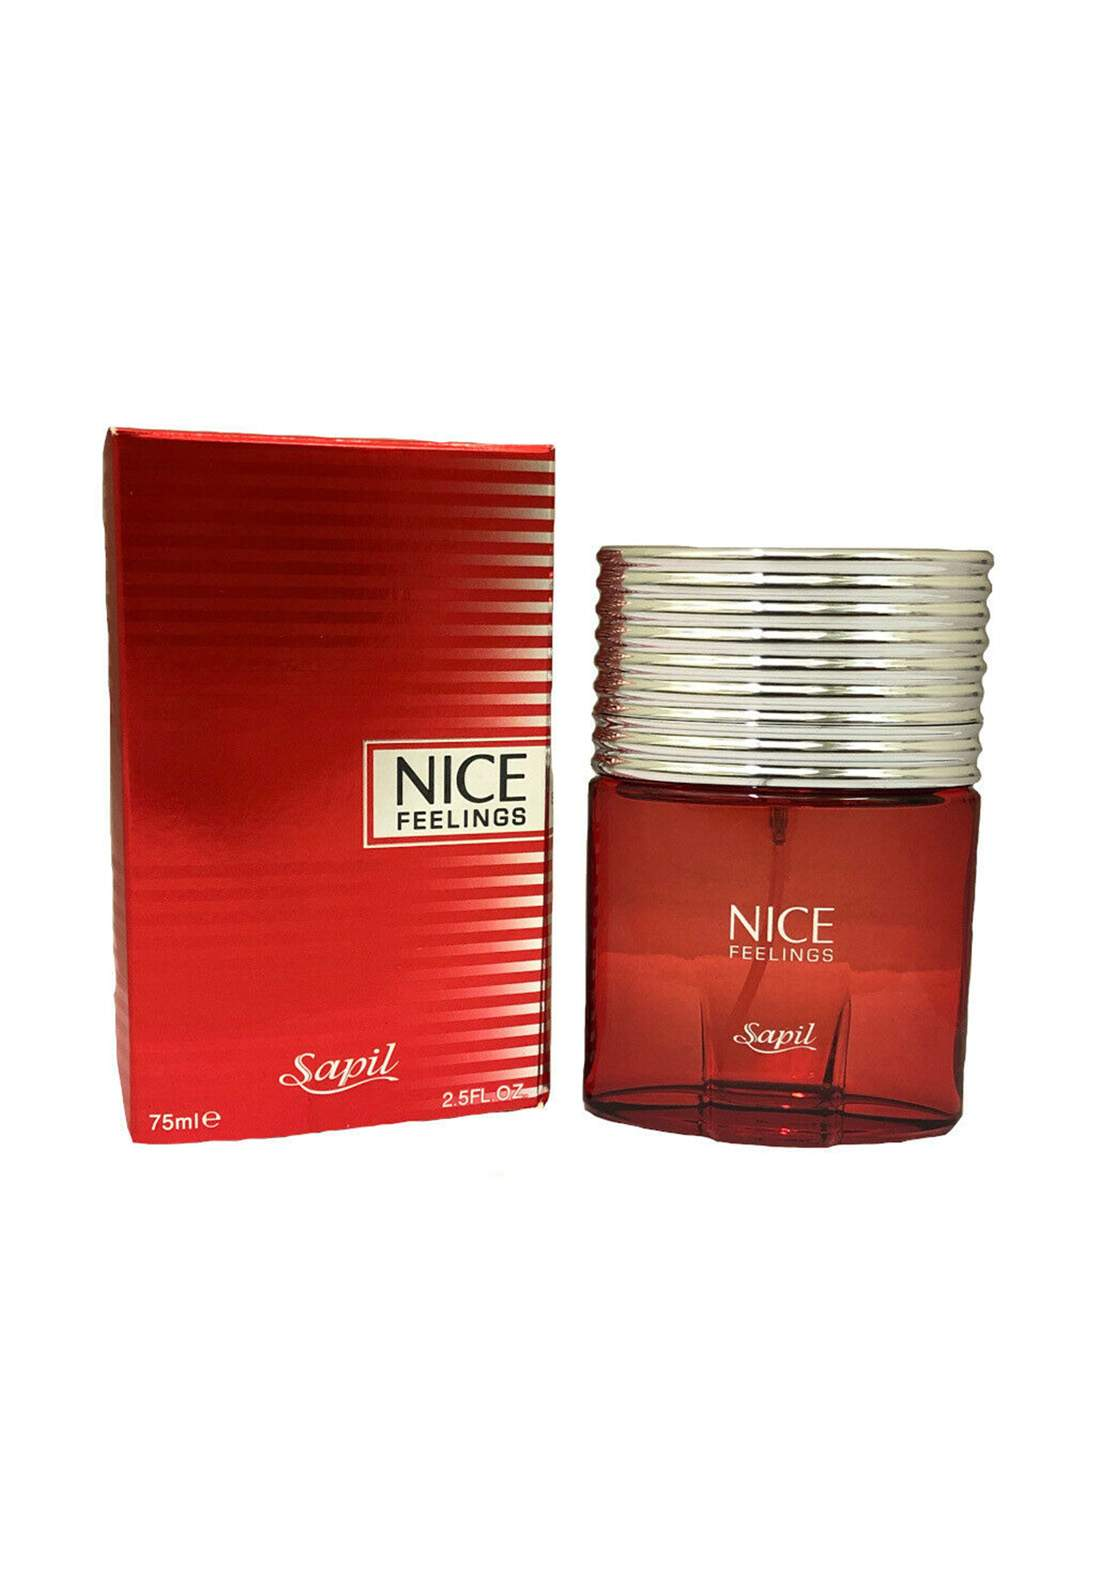 Sapil 350U Nice Feelings  Mens EDT  Woody Citrus Fragrance-75ml  عطر رجالي